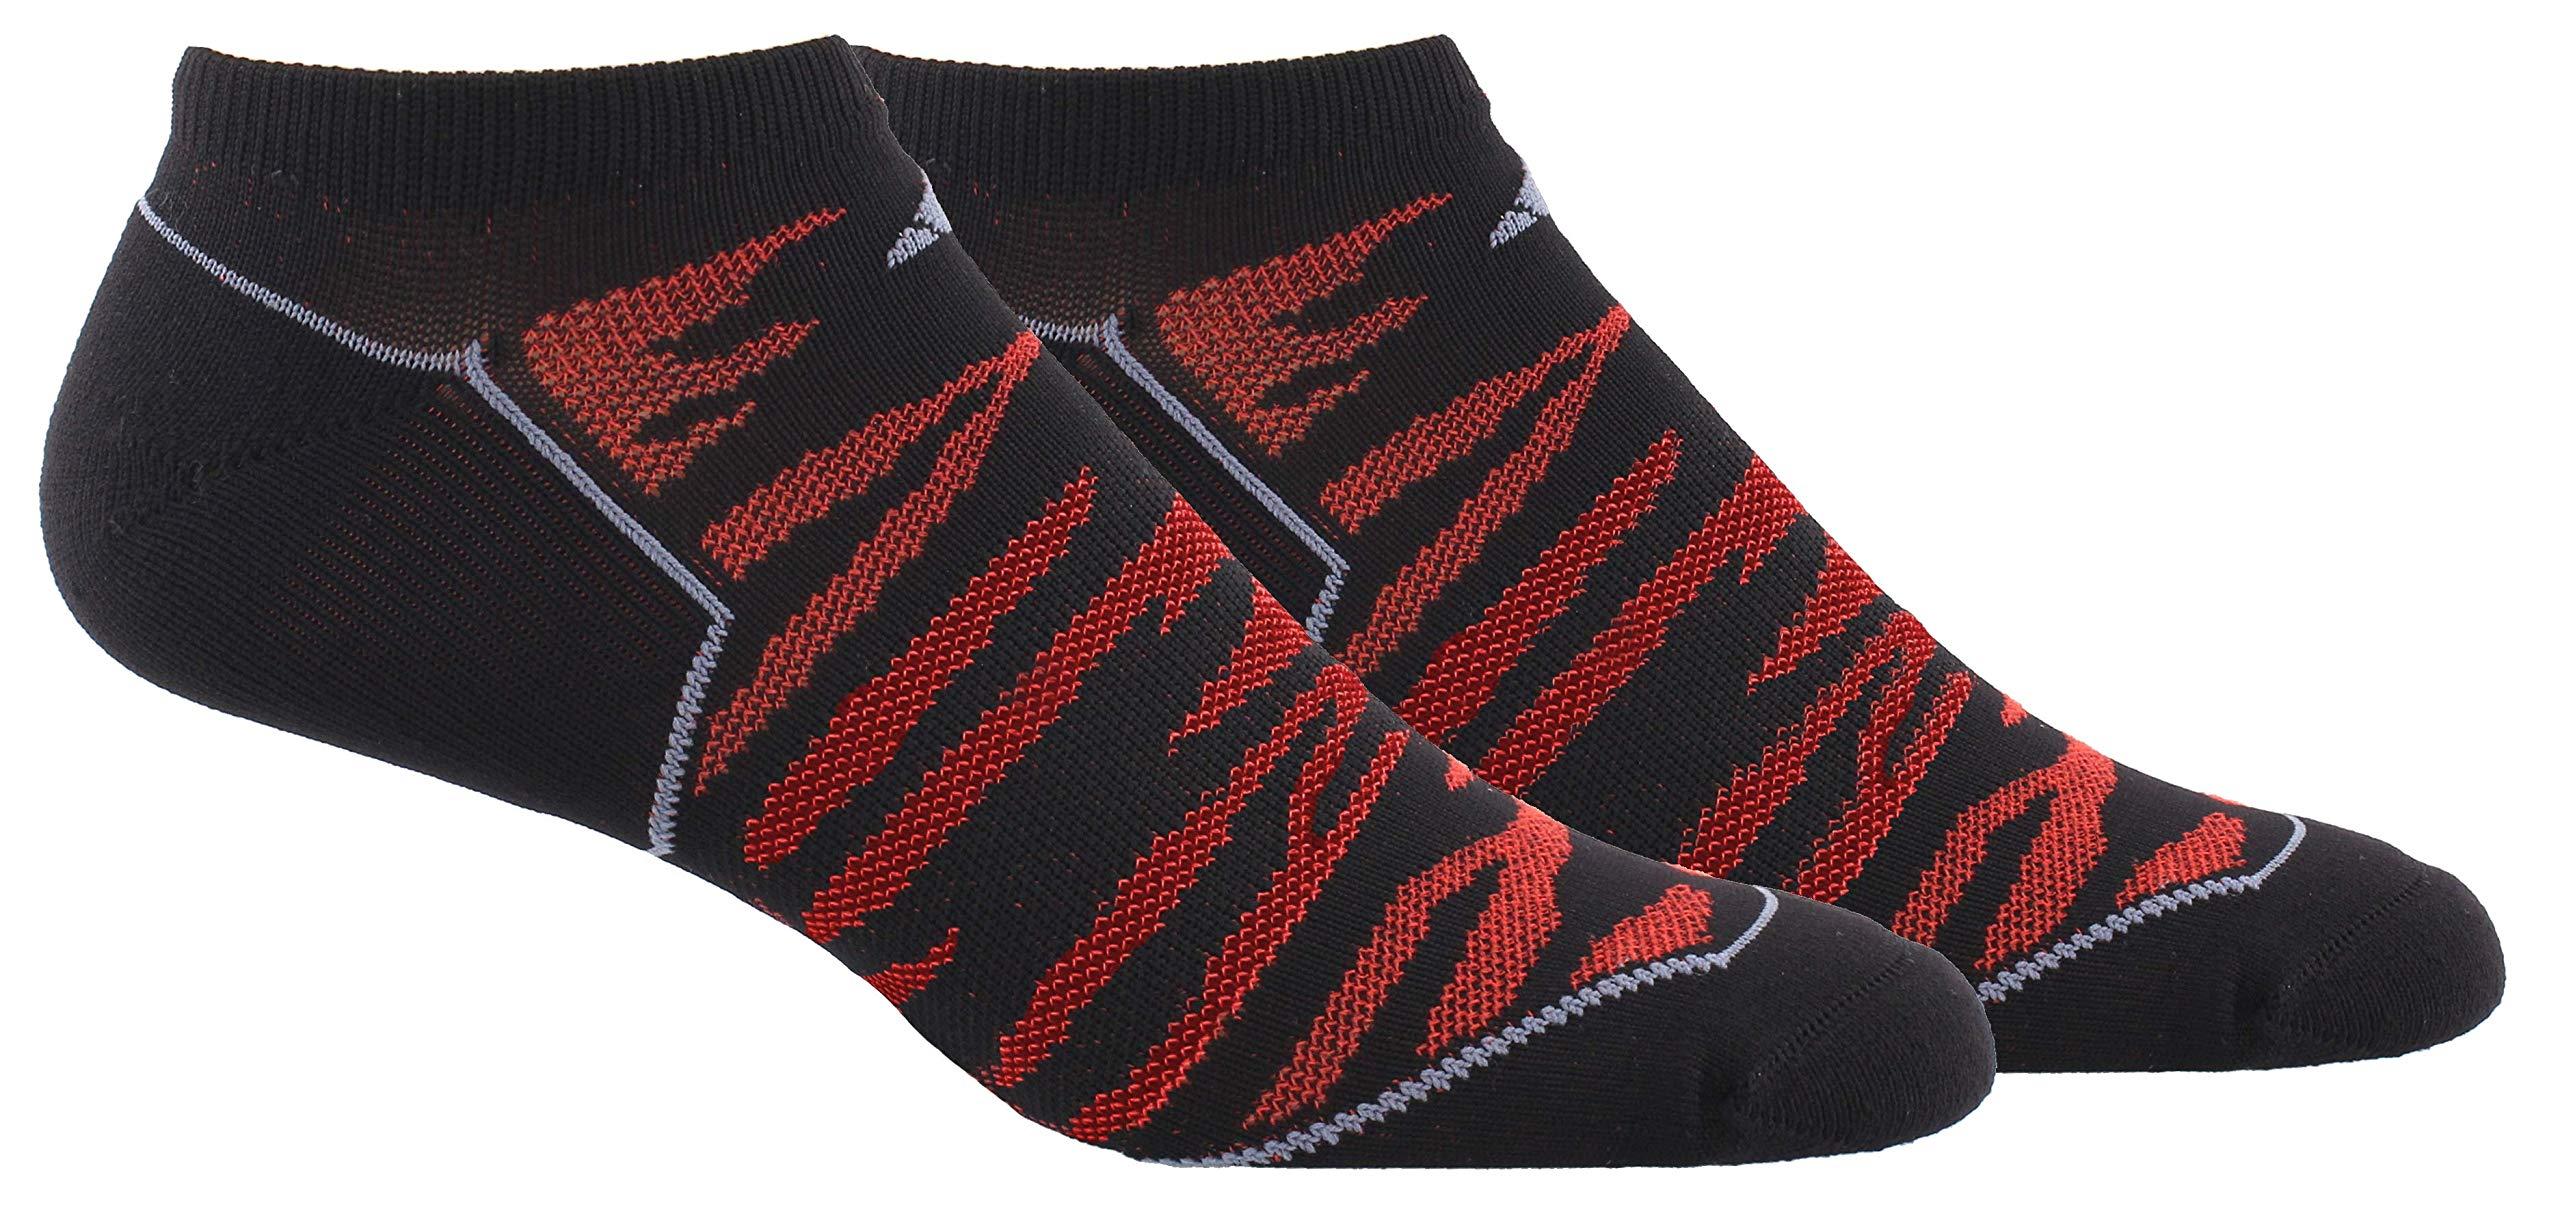 adidas Men's Superlite Prime Mesh No Show Sock (2-Pair), Black/Scarlet/Onix, Large, (Shoe Size 6-12) by adidas